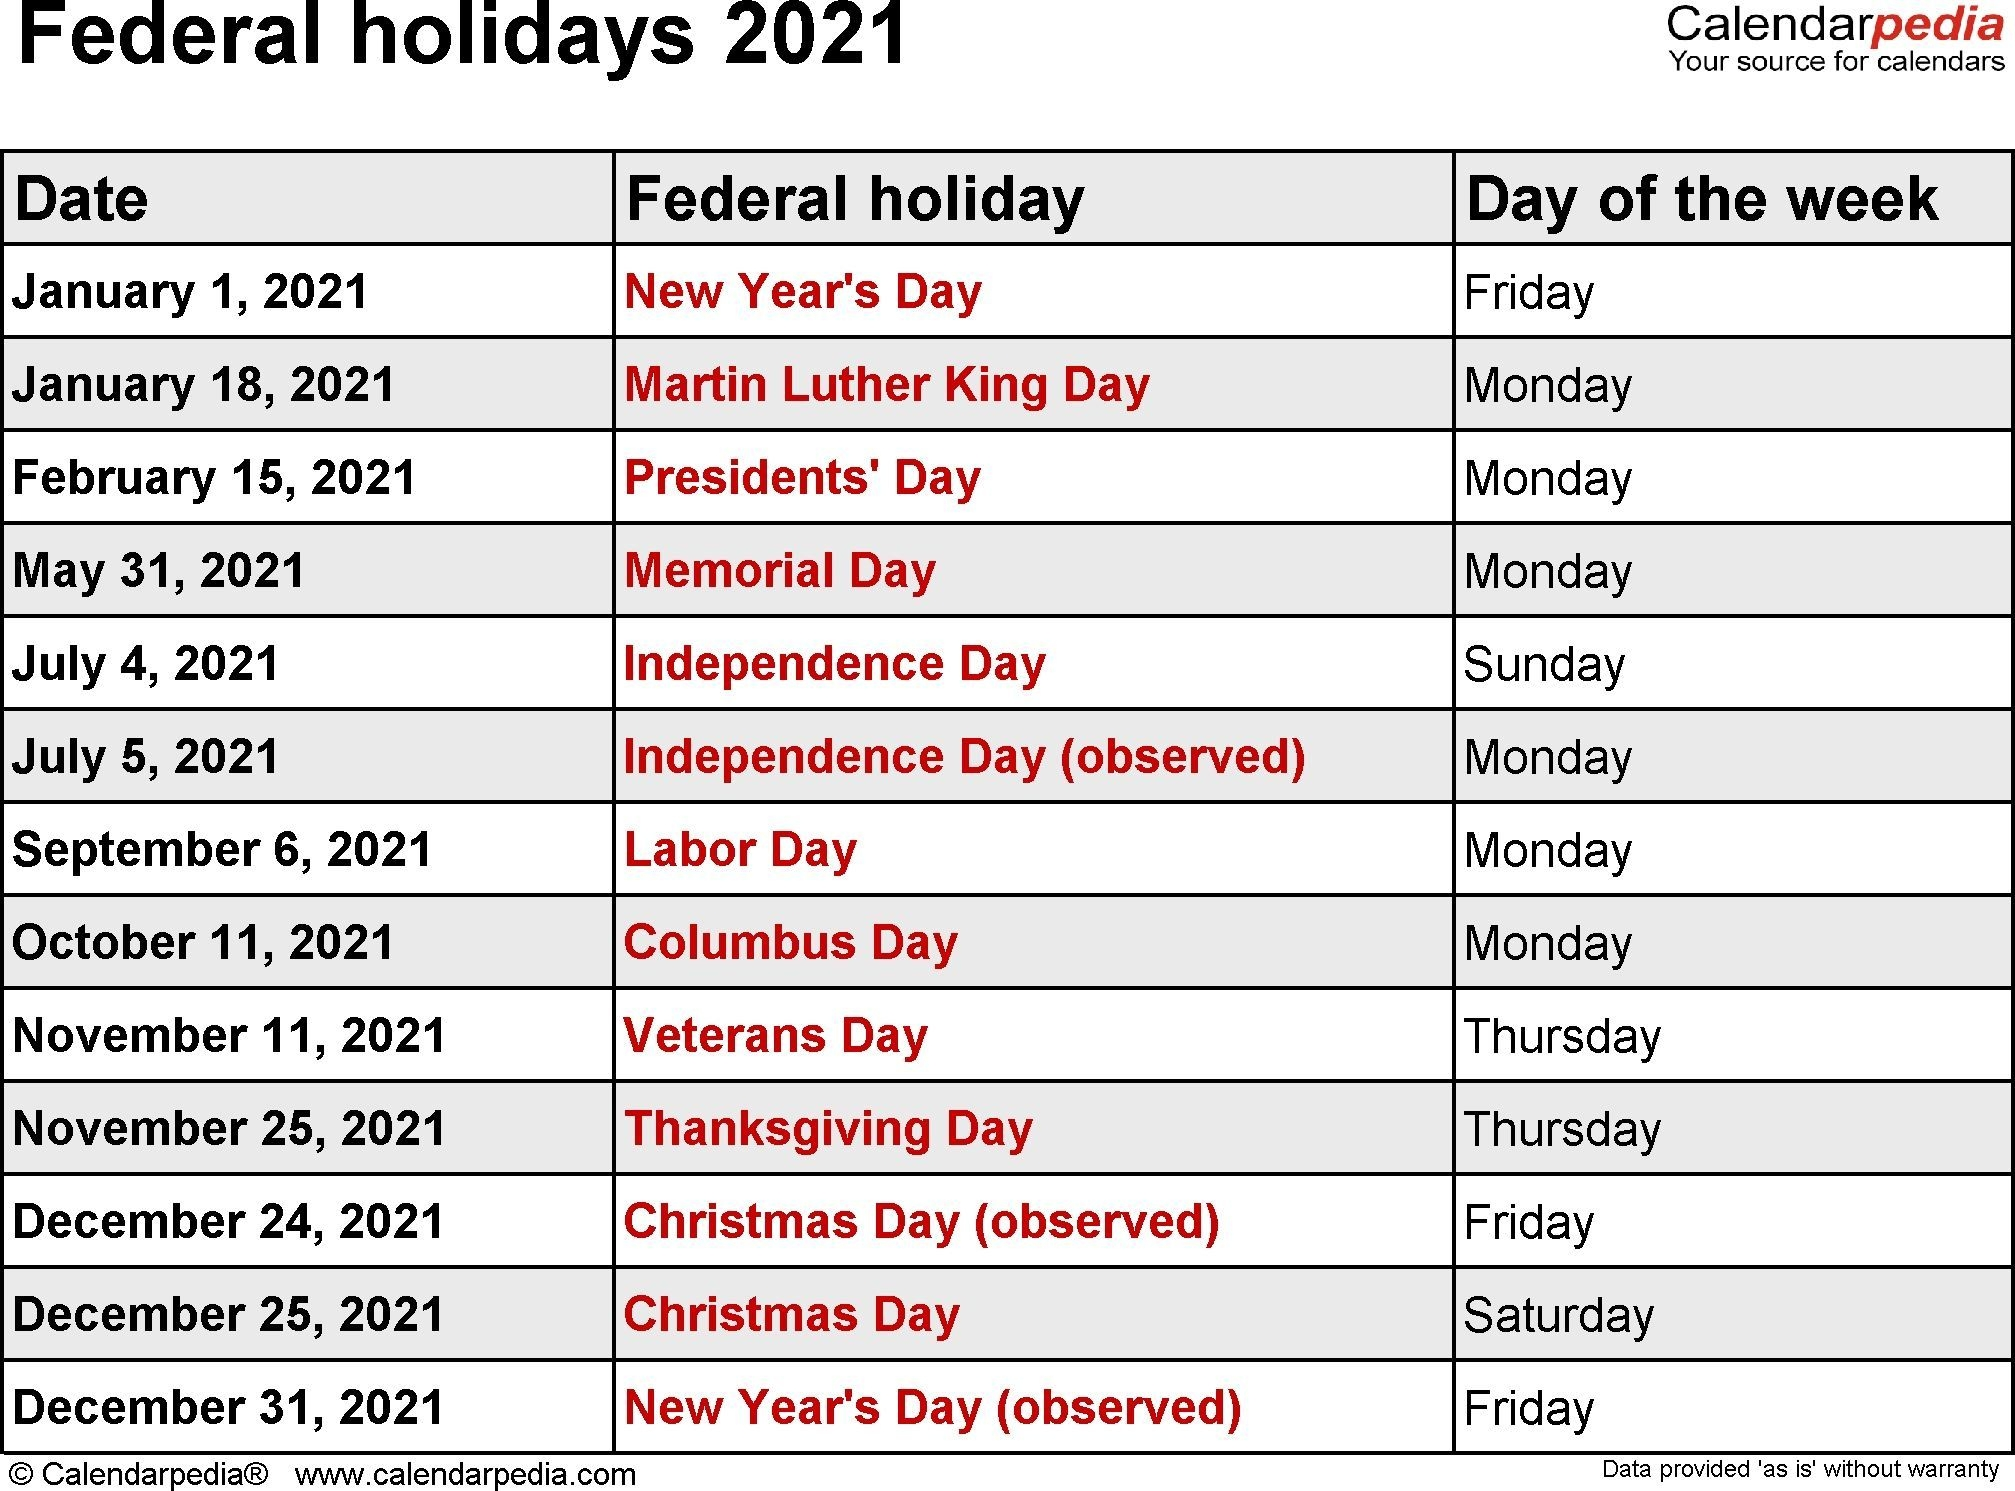 Federal Holidays 2021 Dowload | Holiday Calendar, National